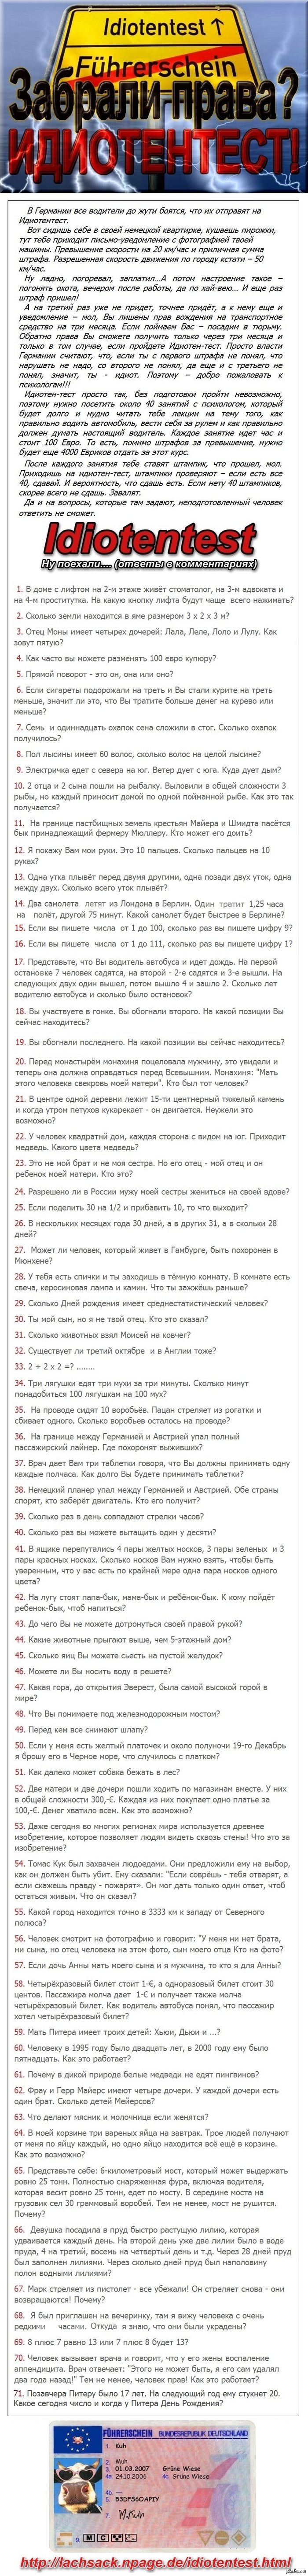 http://cs.pikabu.ru/post_img/2013/08/01/9/1375380560_295111389.jpg